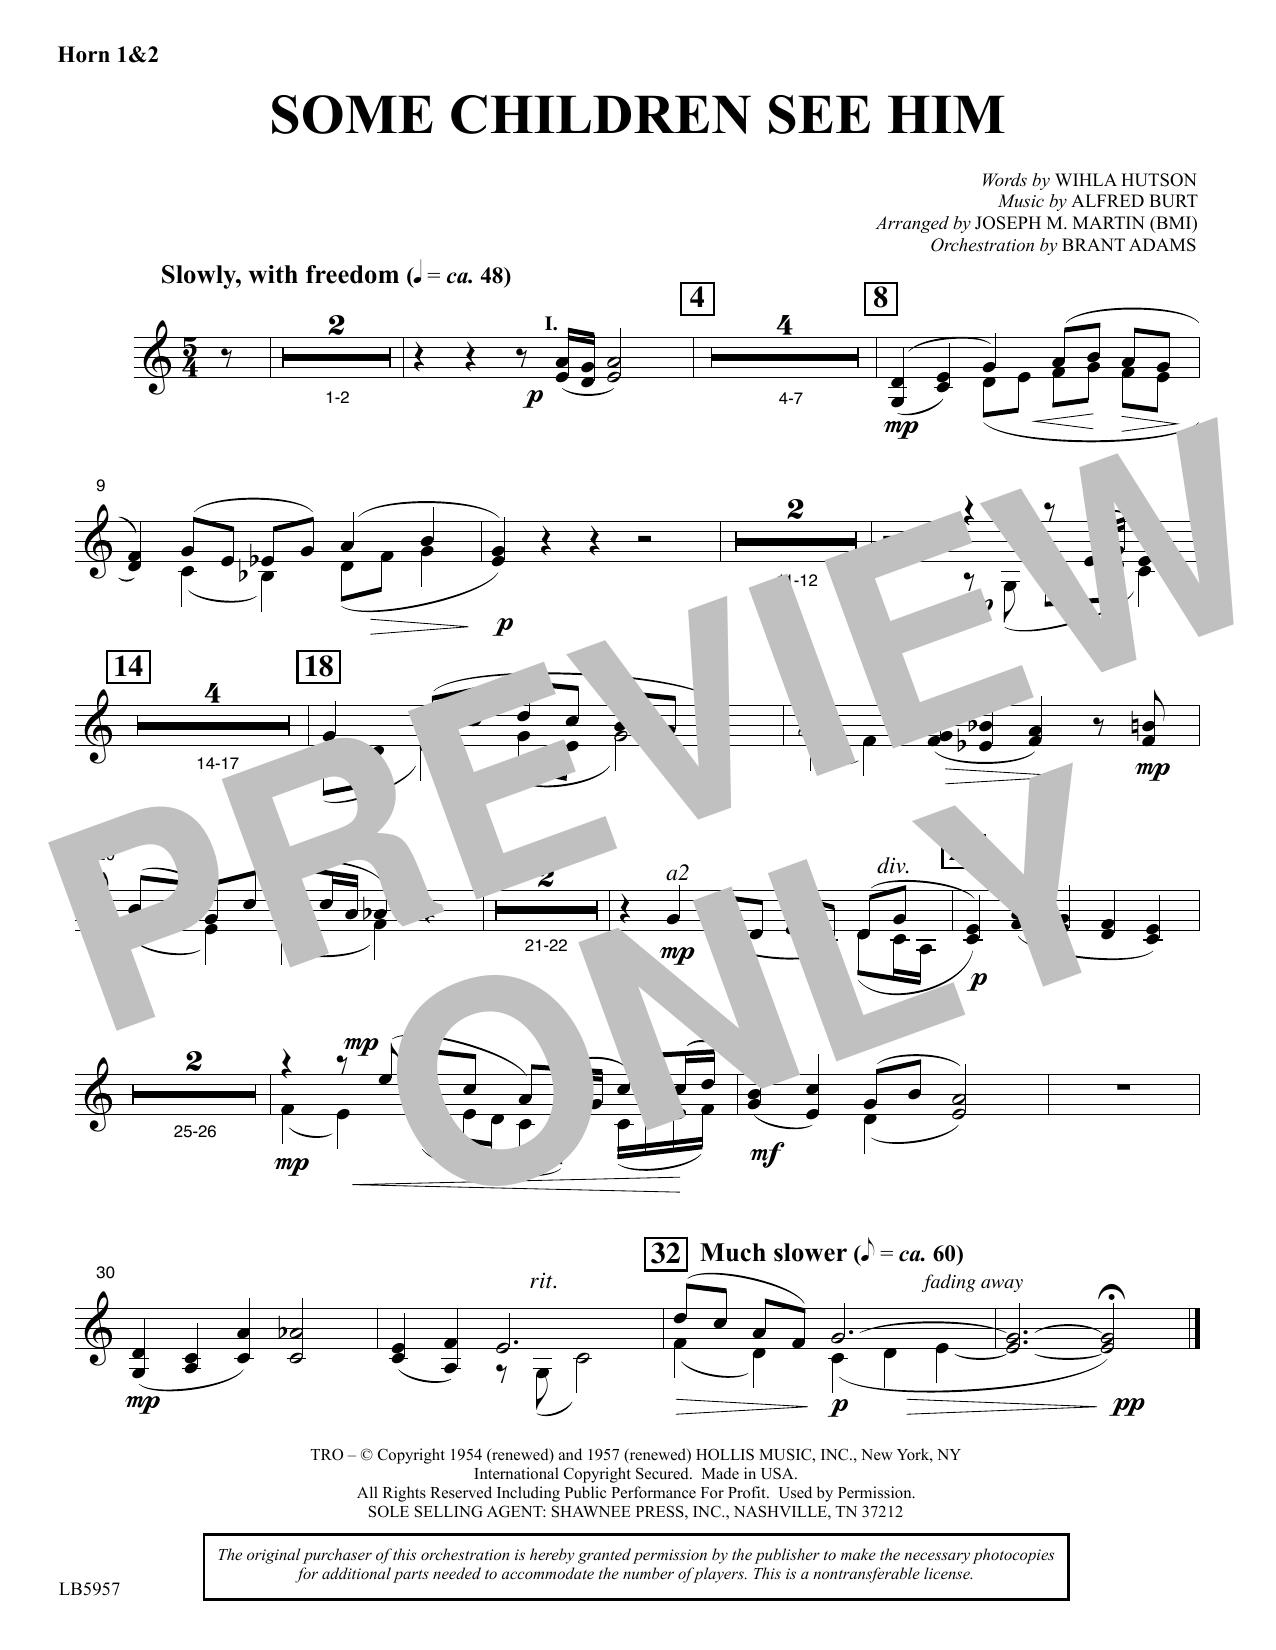 Some Children See Him (arr. Joseph M. Martin) - Horn 1 & 2 Sheet Music